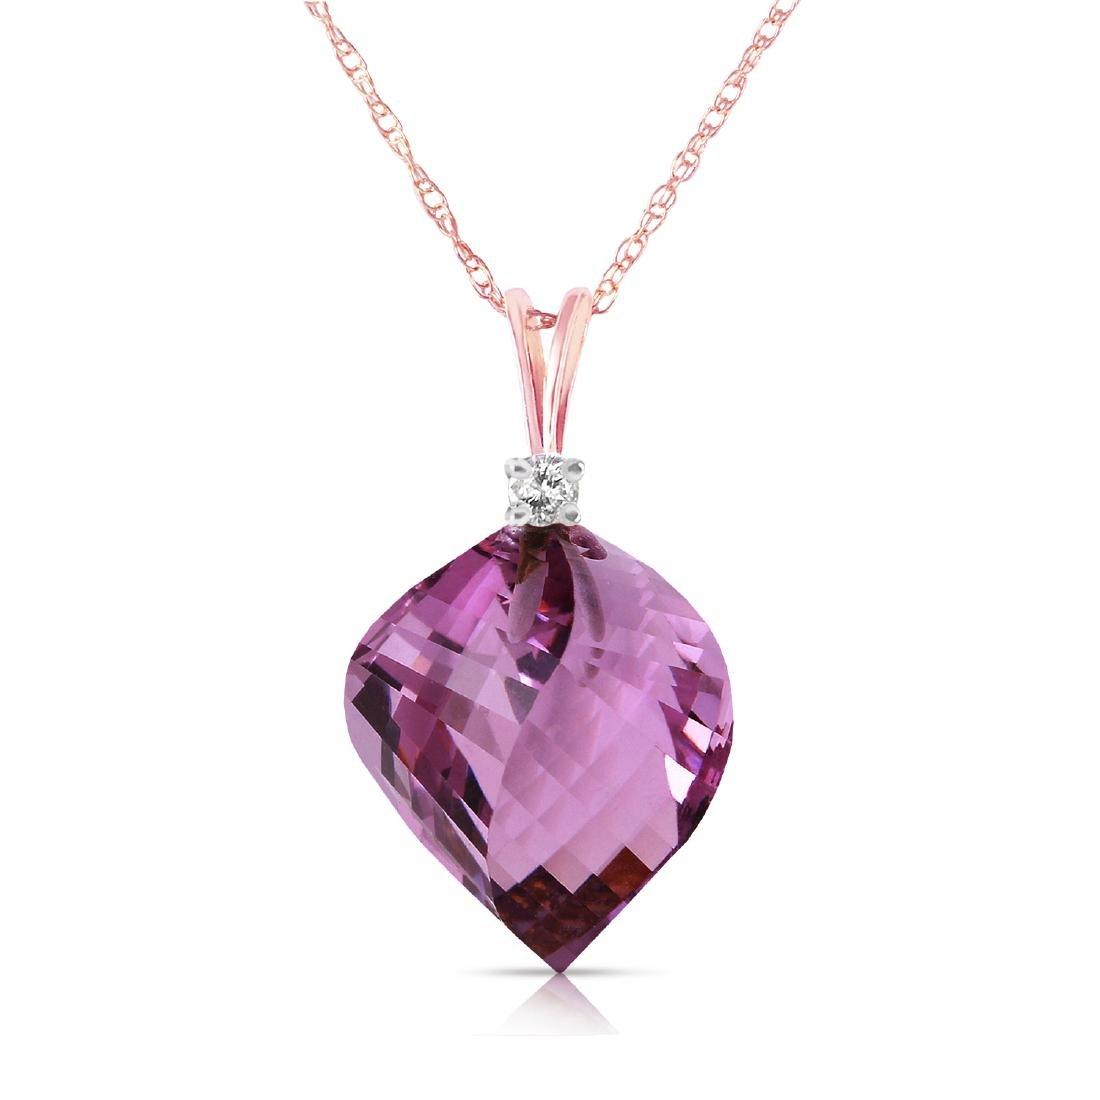 Genuine 10.80 ctw Amethyst & Diamond Necklace Jewelry